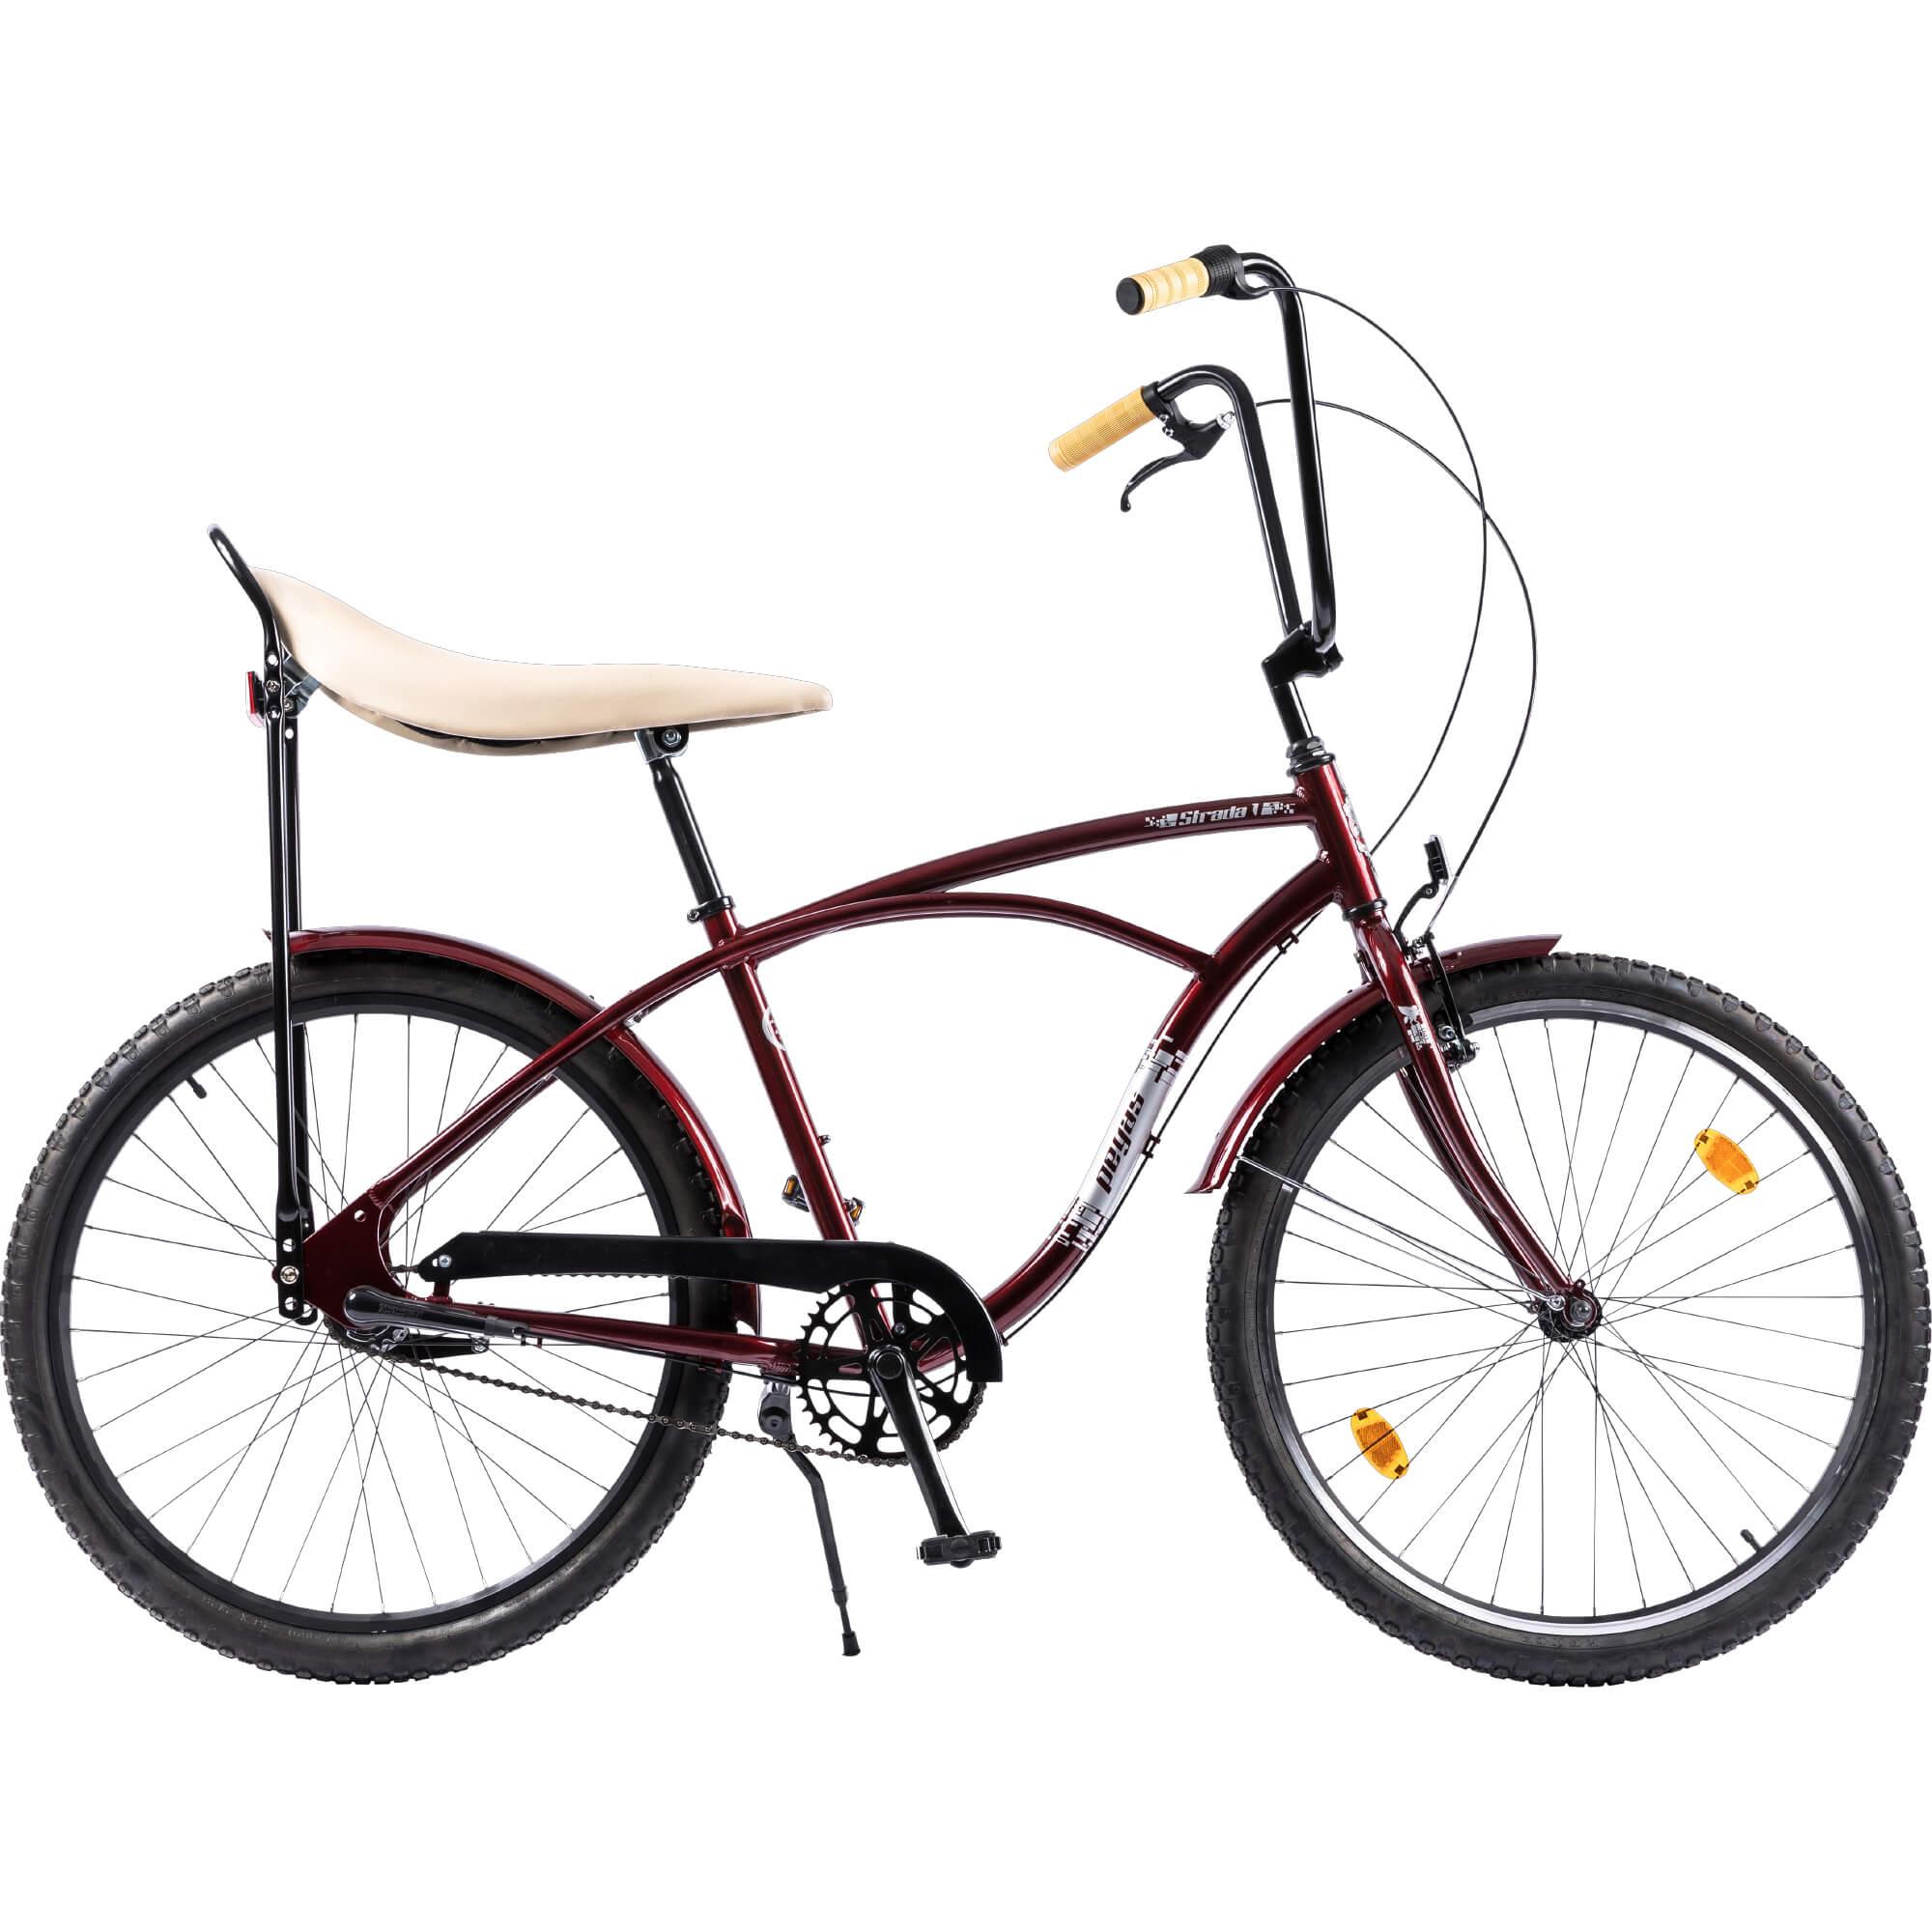 Citybike Strada 1 Pegas